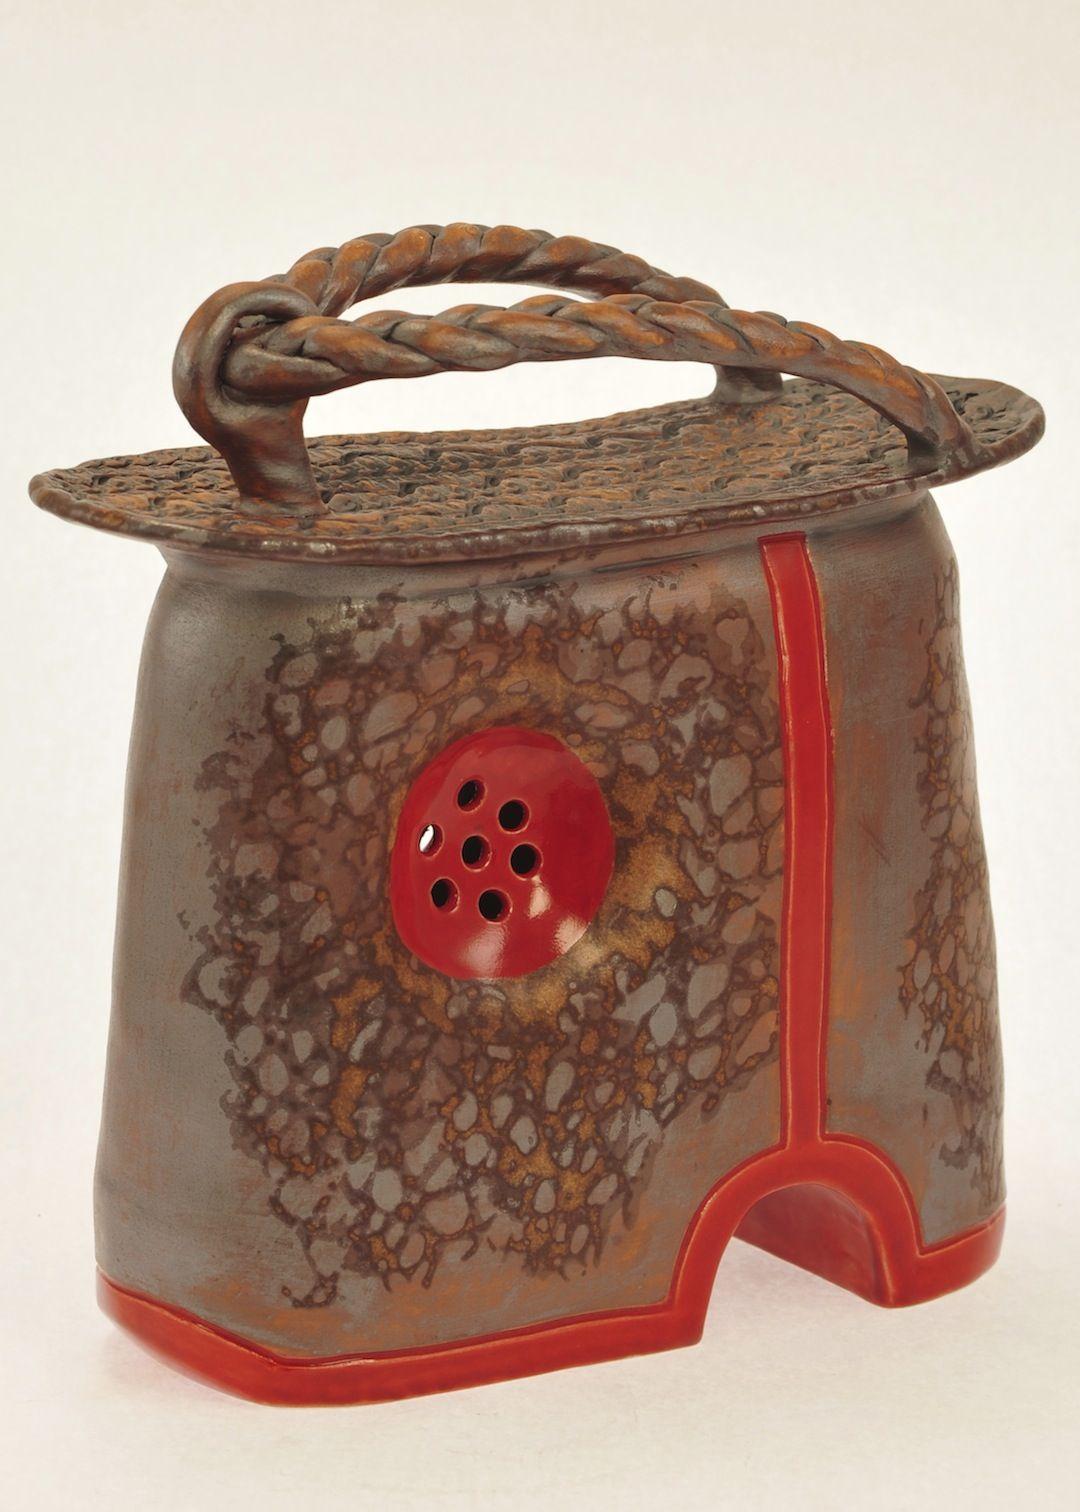 Japanese High-platform Shoe Ceramic art by Kathy Hintz